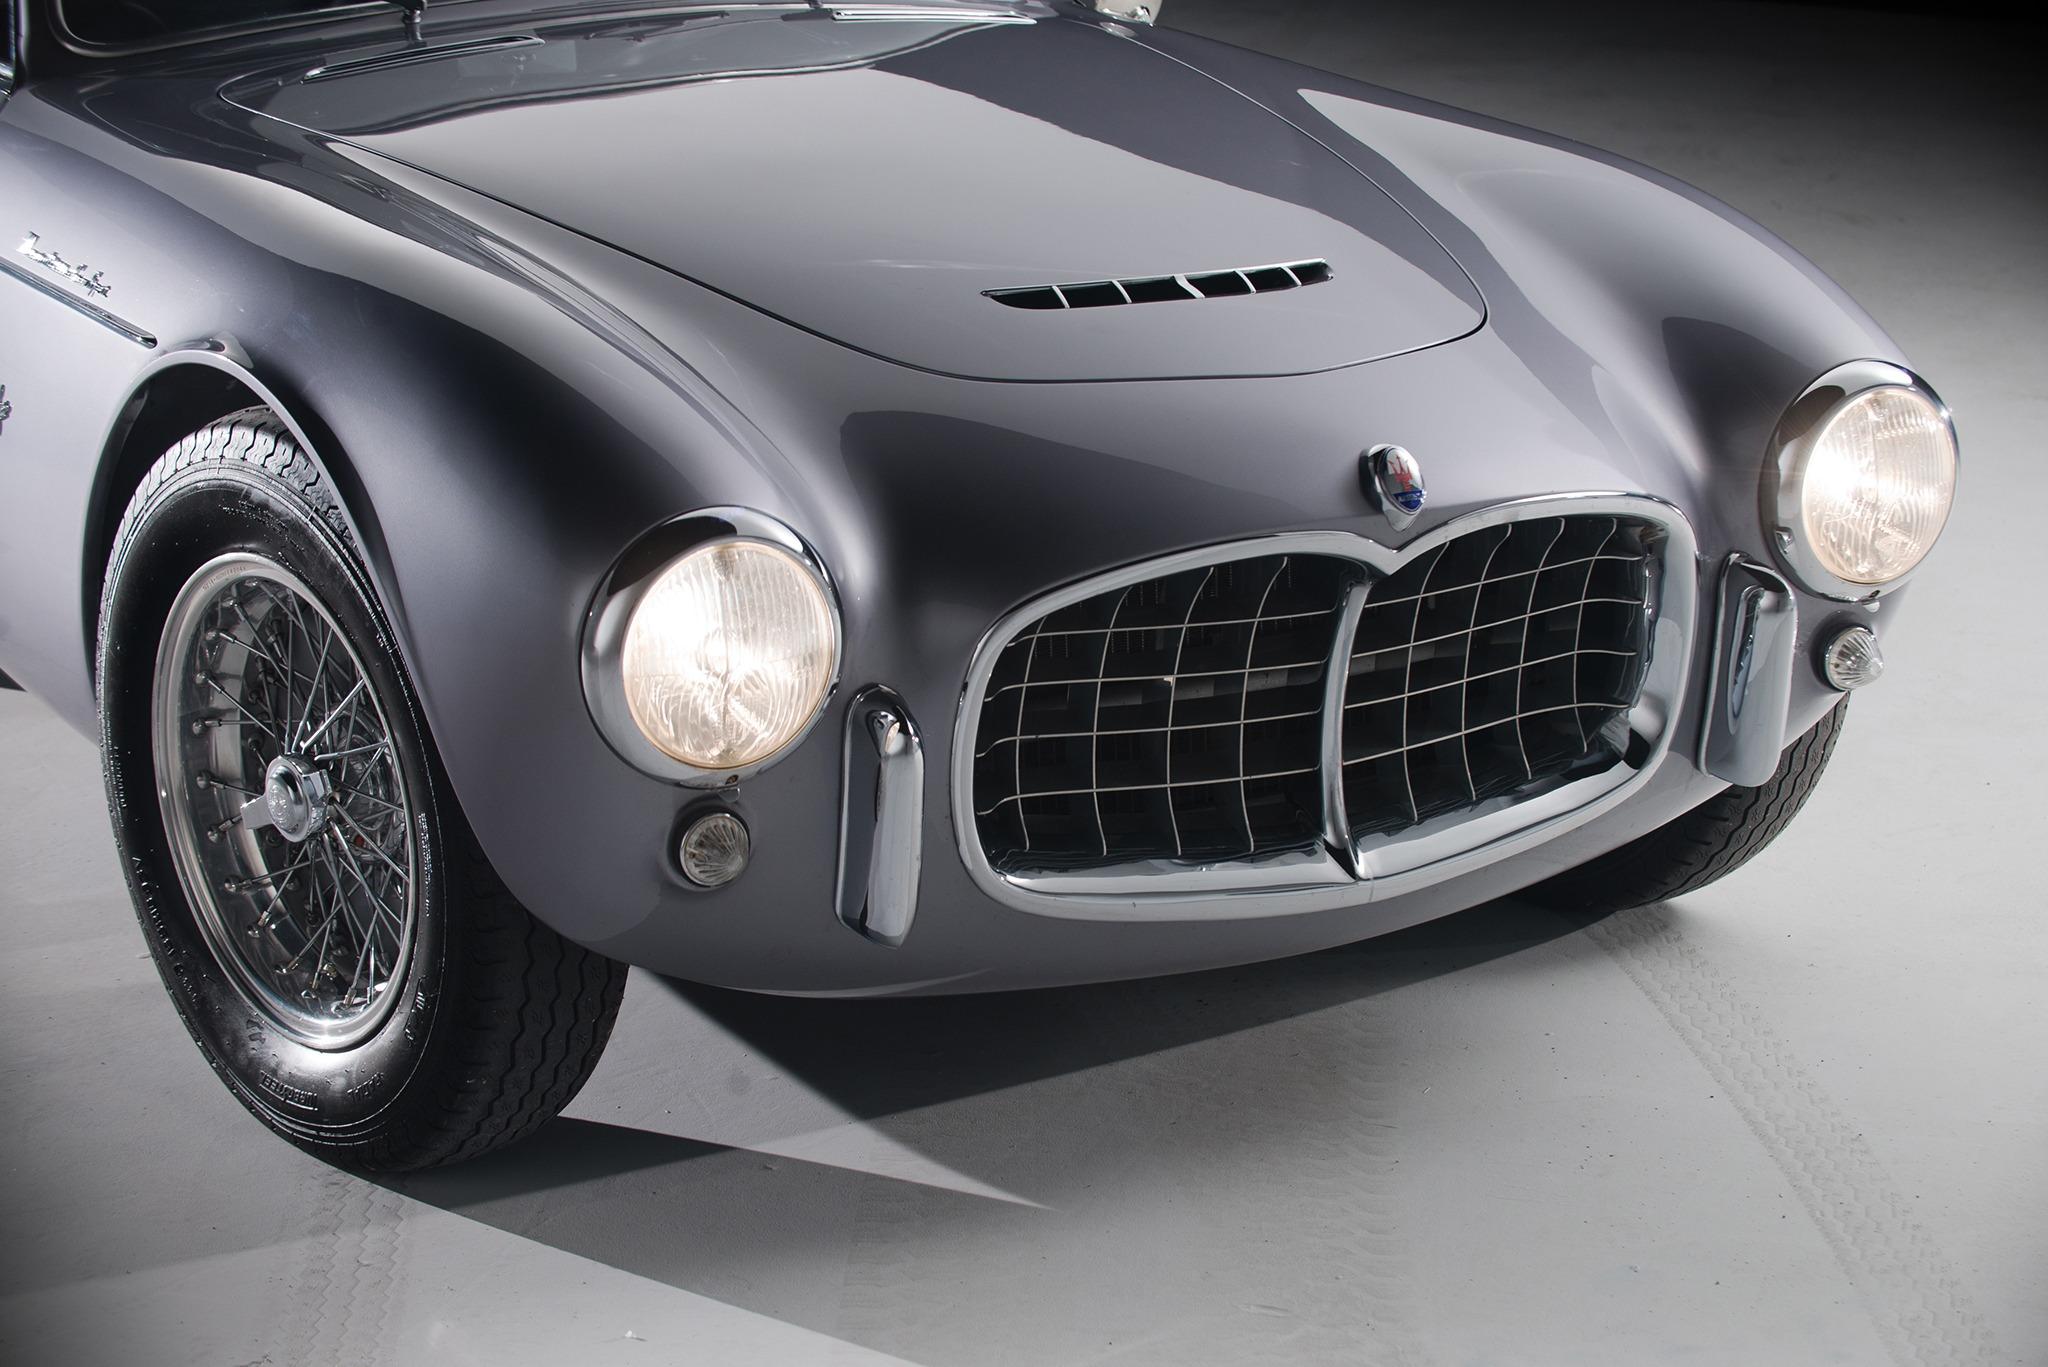 1956-Frua-Maserati-A6G-2000-Spyder-05